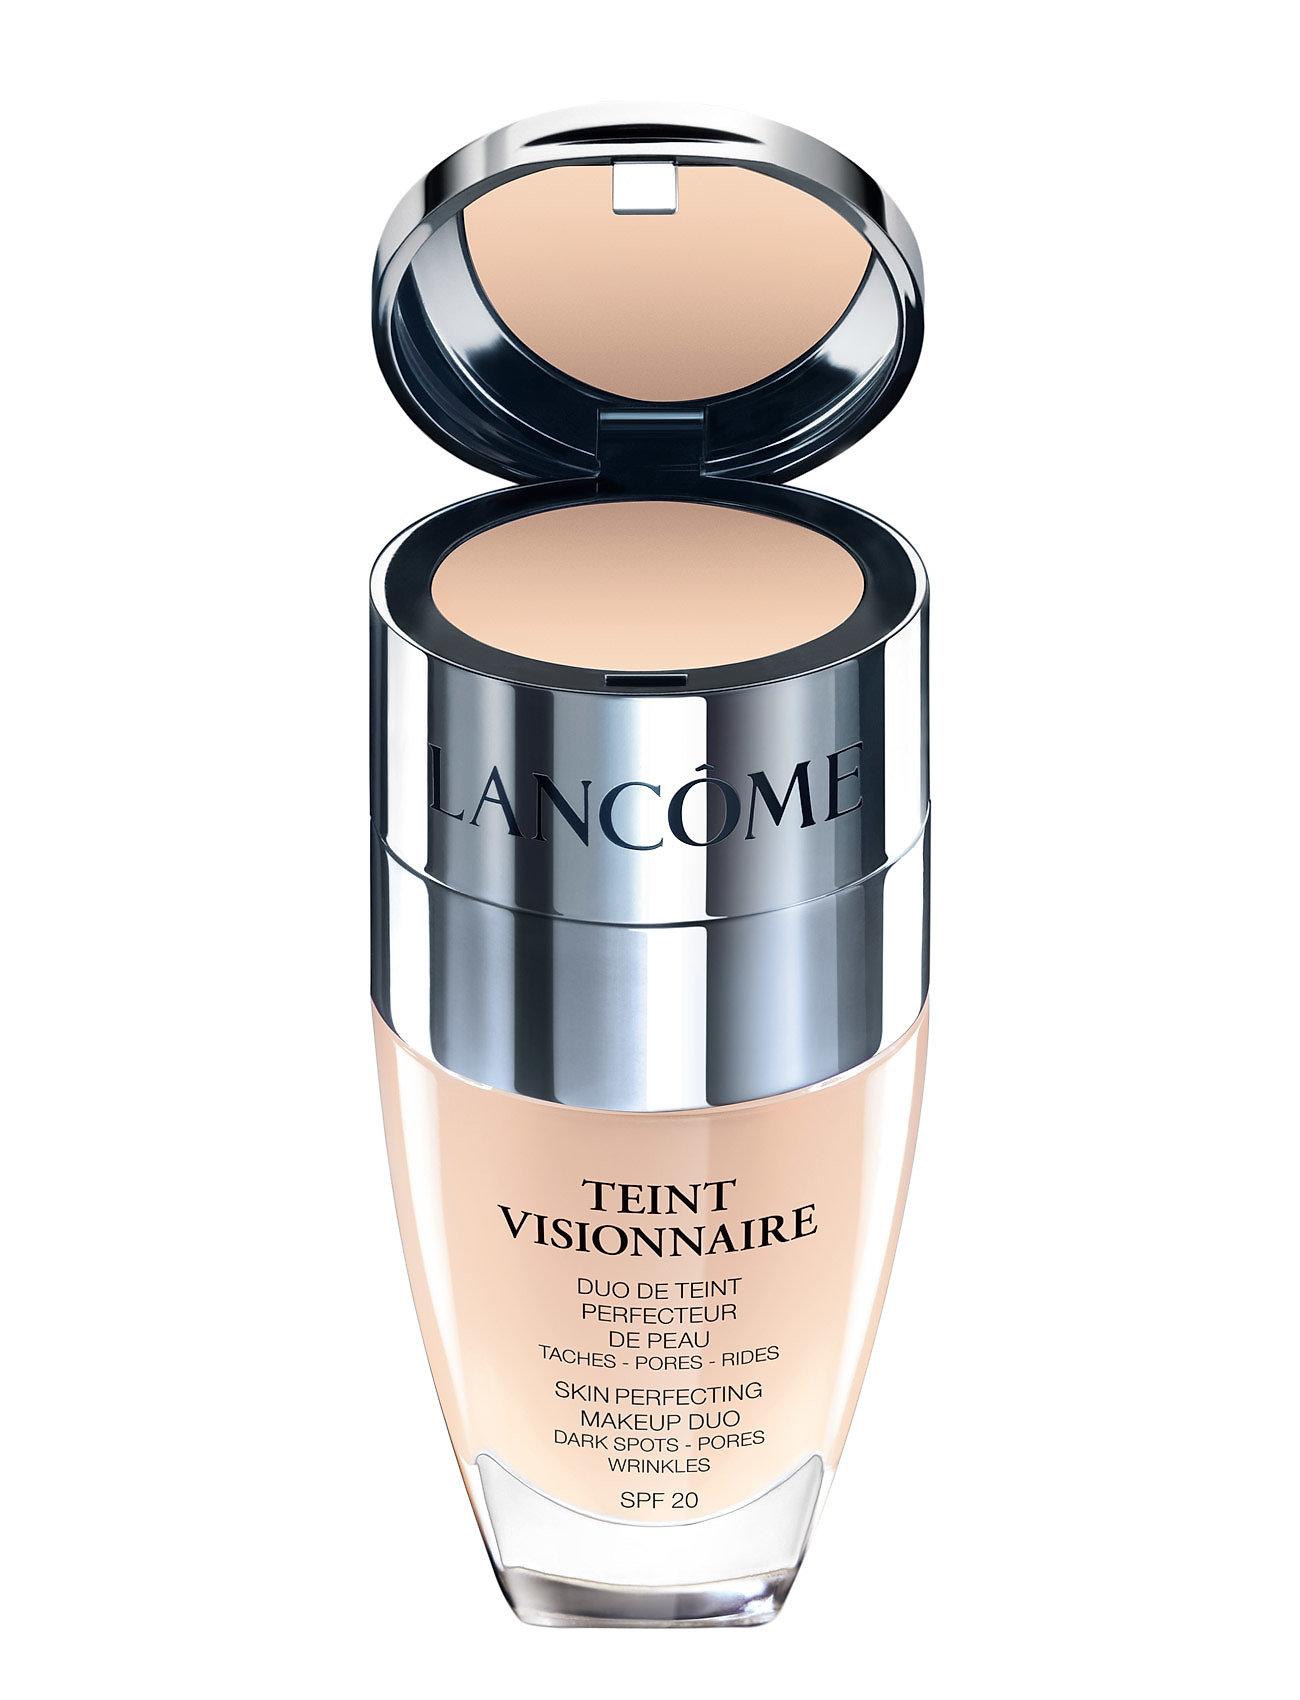 Lancôme Teint Visionnaire Foundation